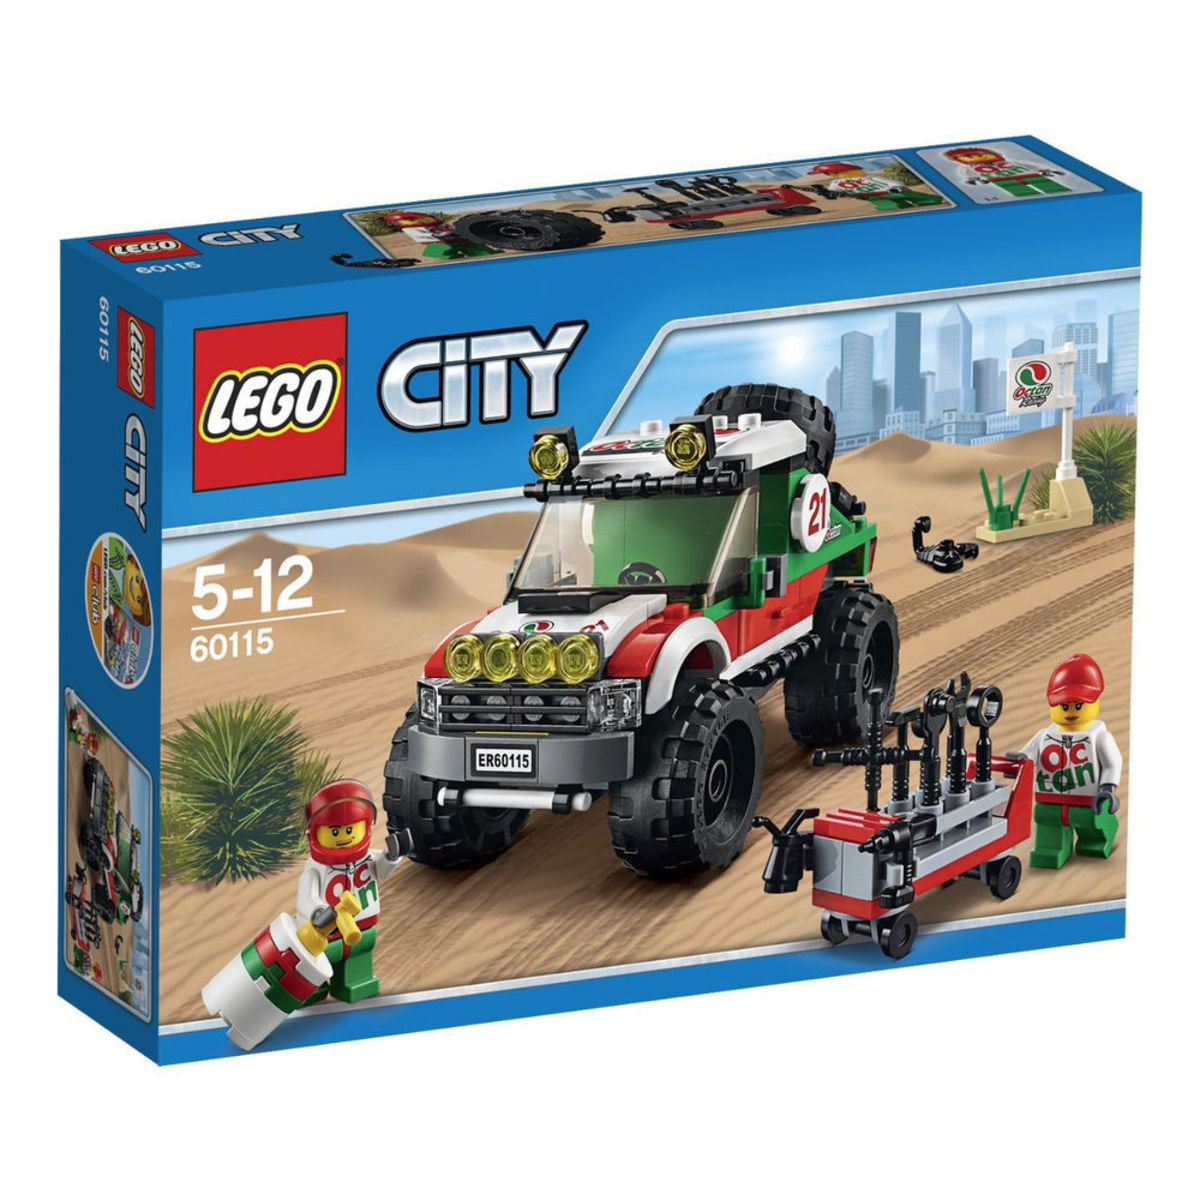 60115 City Great Vehicles 4 x 4 越野車